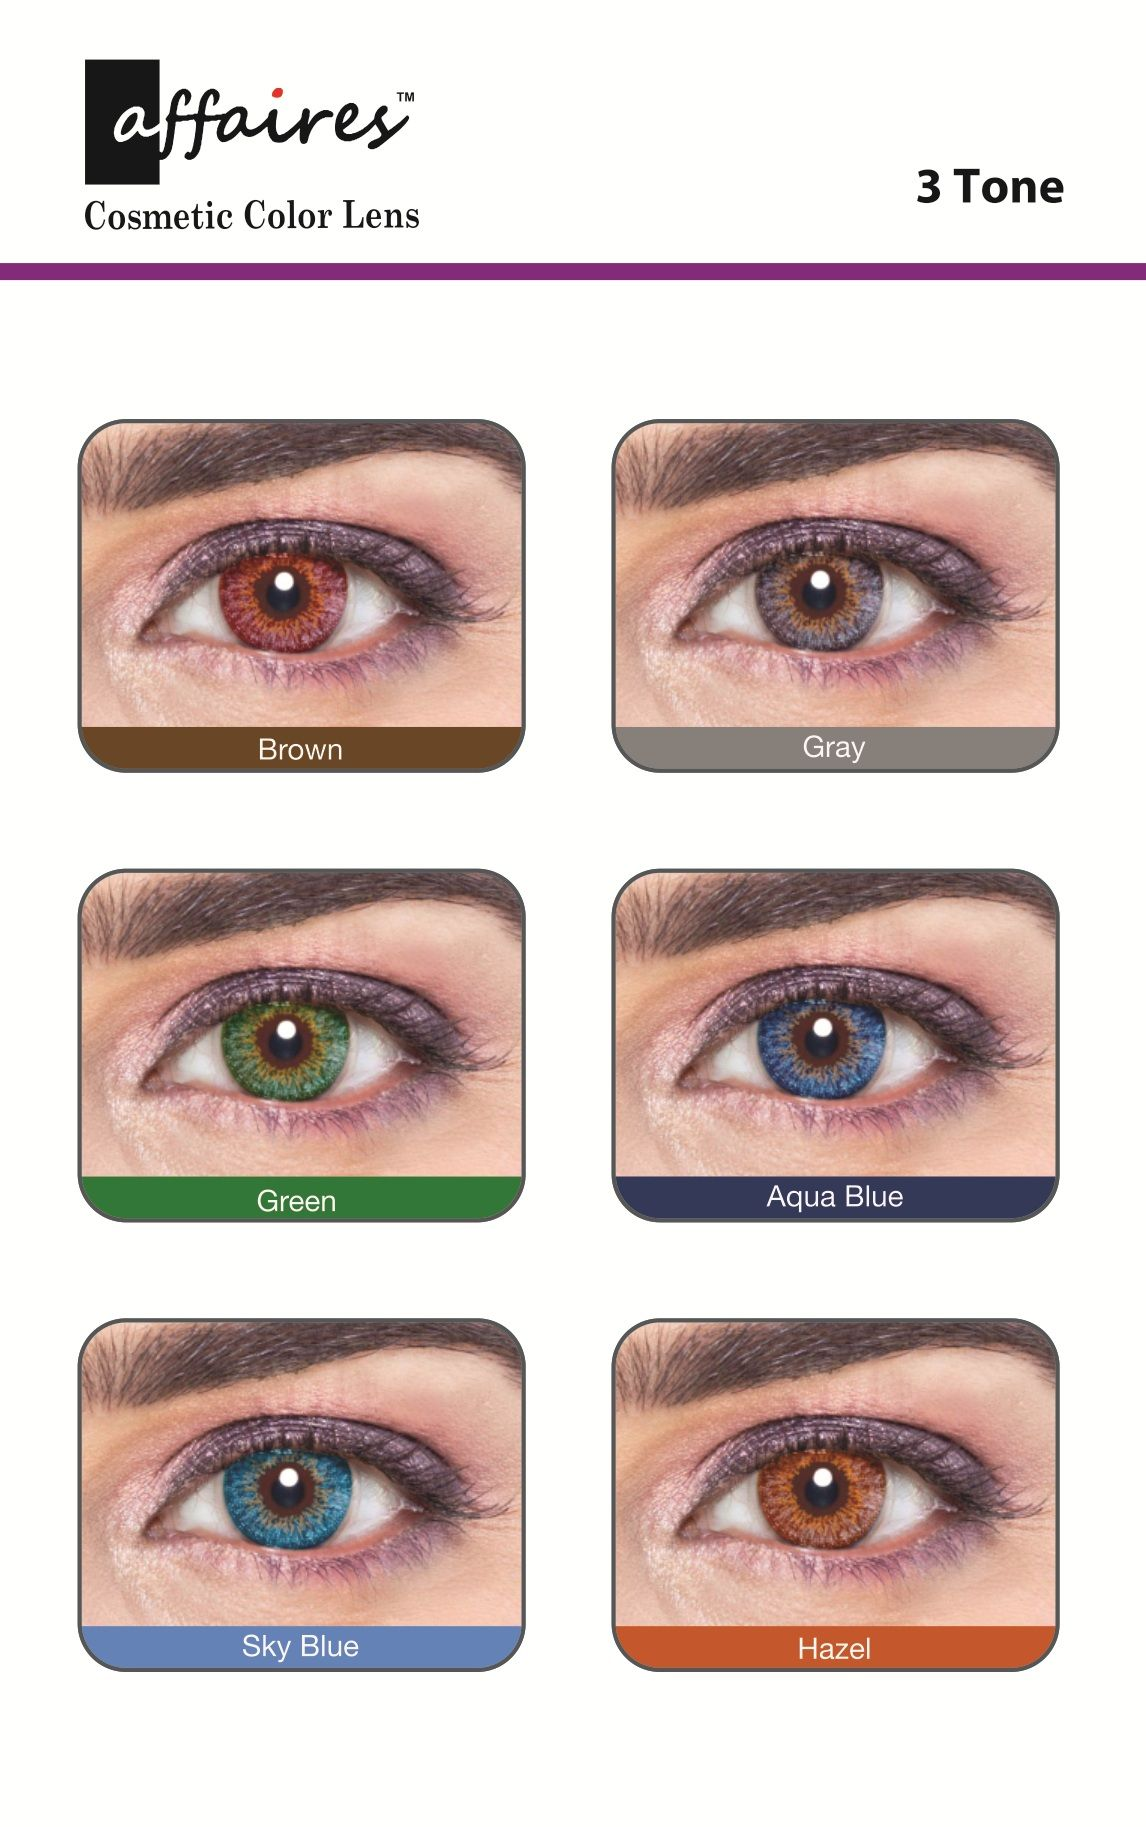 Affaires Color Contact Lenses Chart 3 Tone Contact Lenses Colored Colored Contacts Color Cosmetics